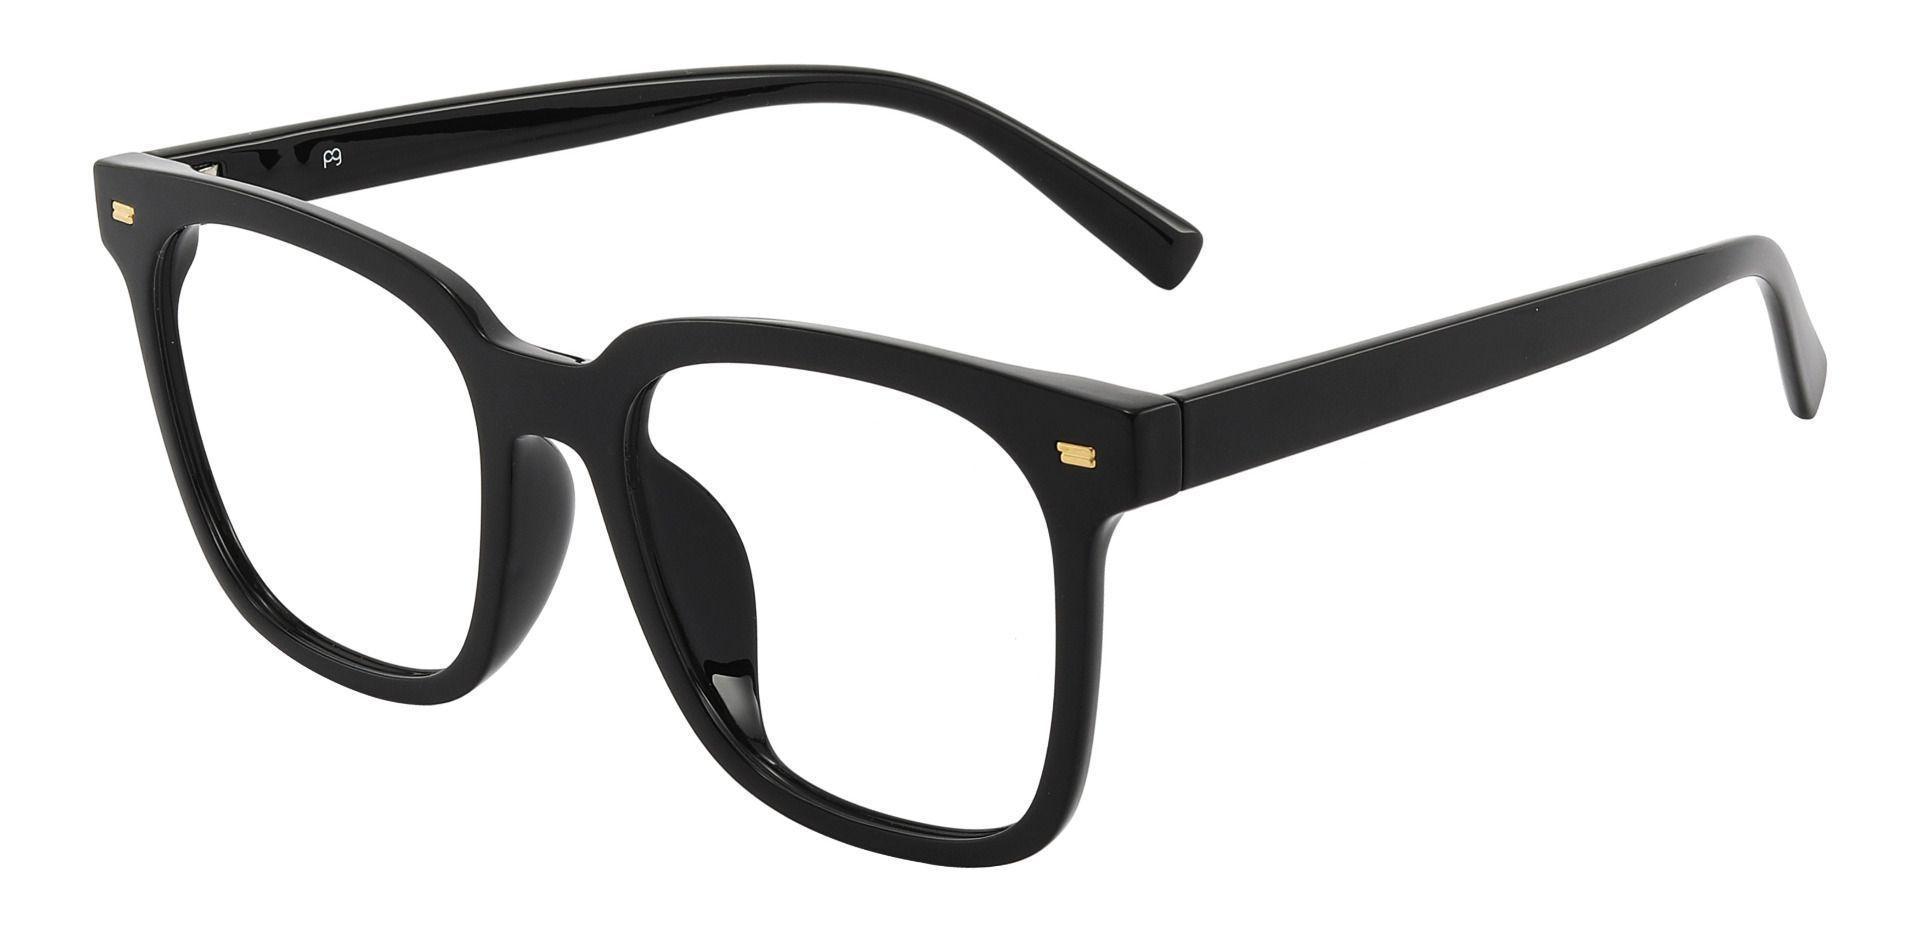 Charlie Oversized Prescription Glasses - Black